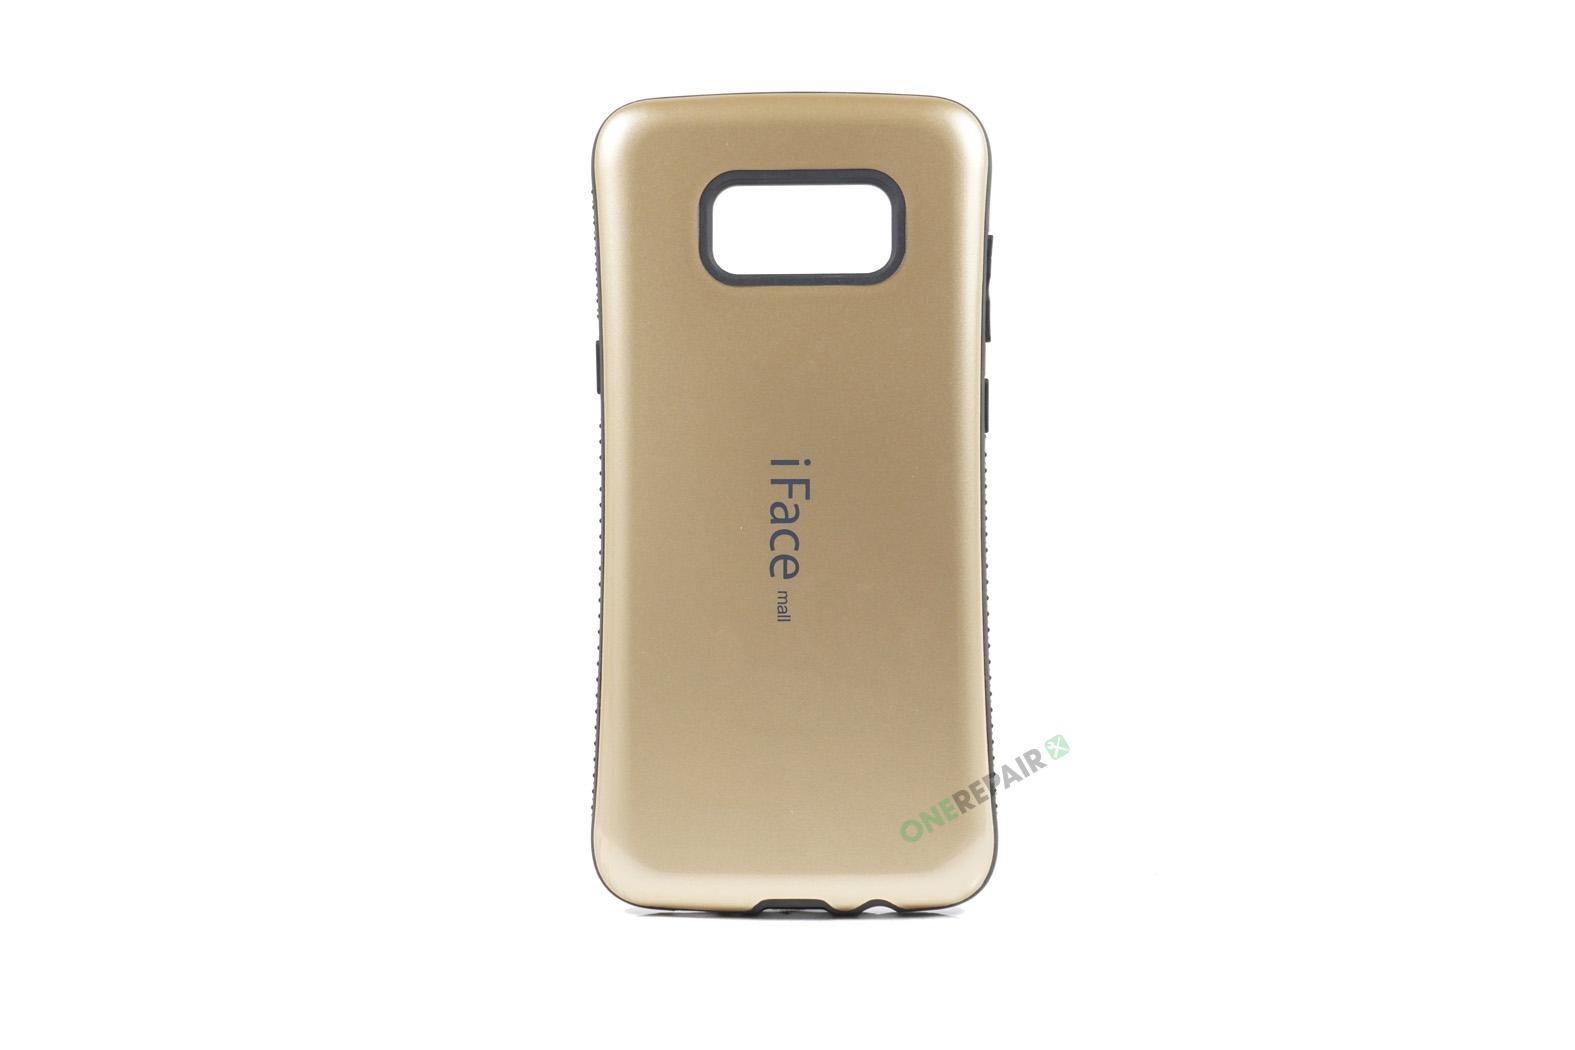 350711_Samsung_S8_iFace_Cover_Haandvaerker_Guld_OneRepair_00001